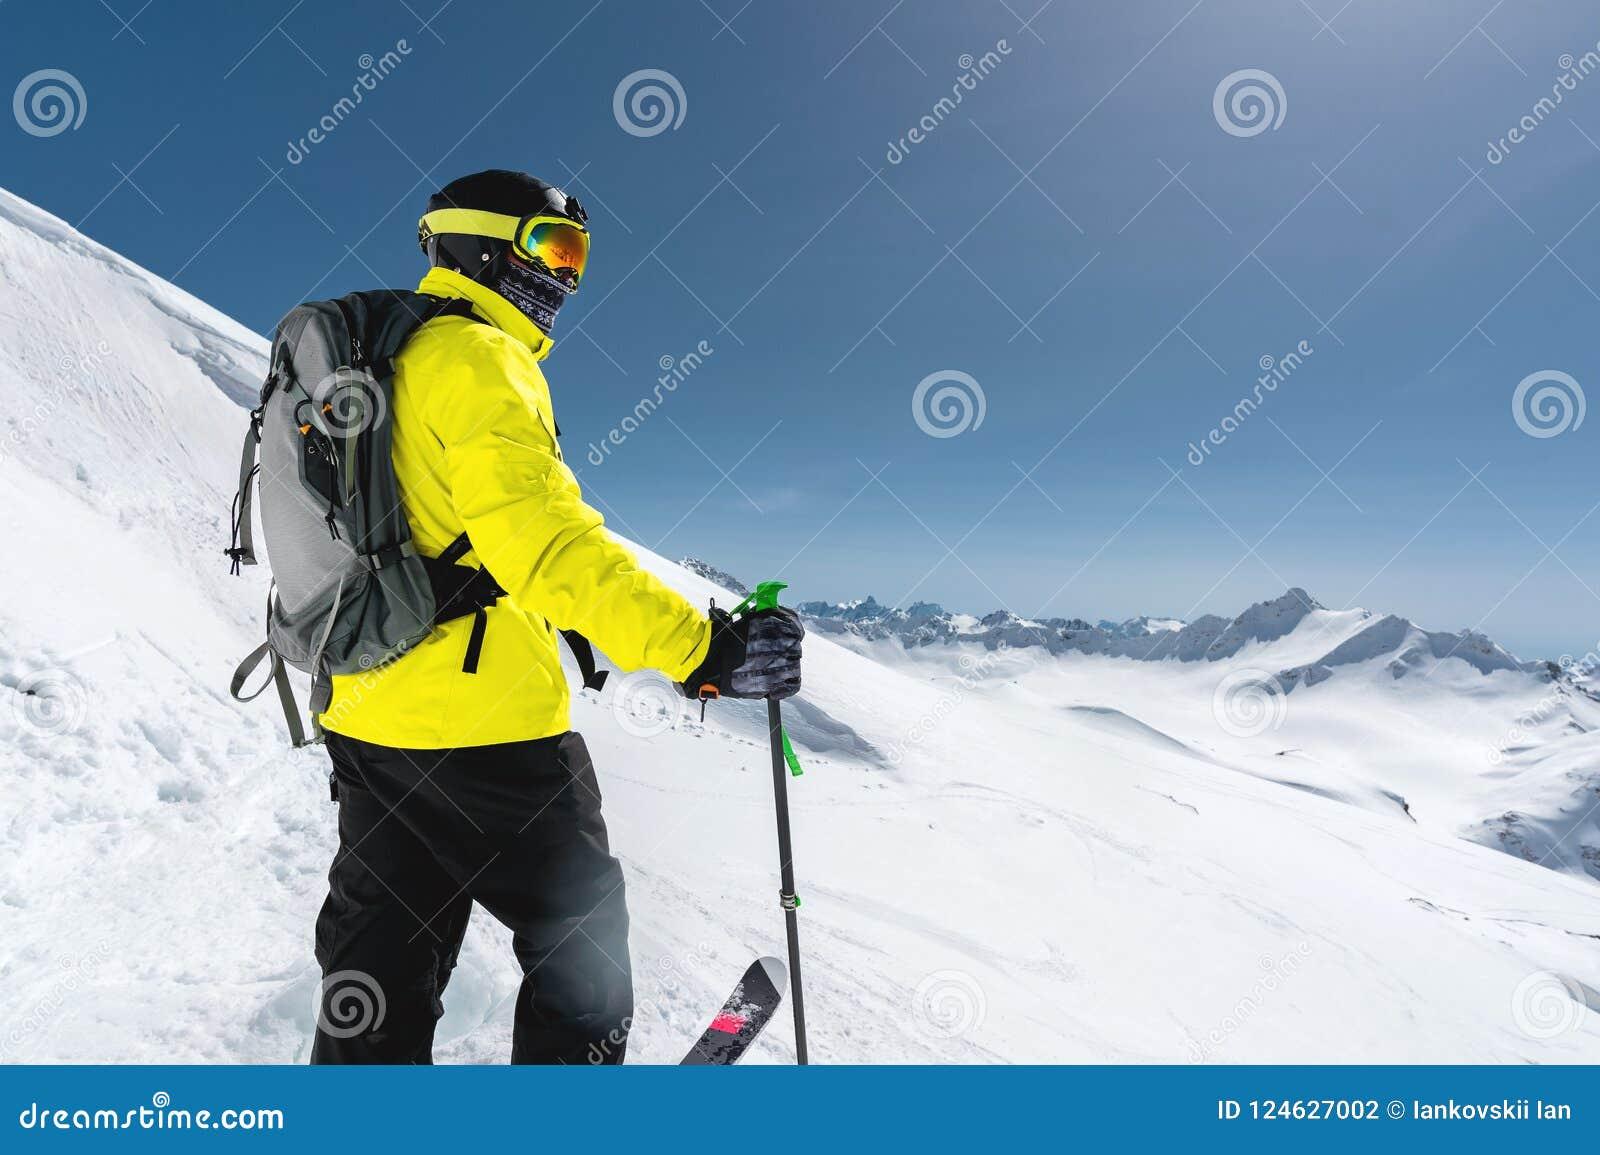 Stående av ett yrkesmässigt freerider skidåkareanseende på en snöig lutning mot bakgrunden av snö-korkade berg